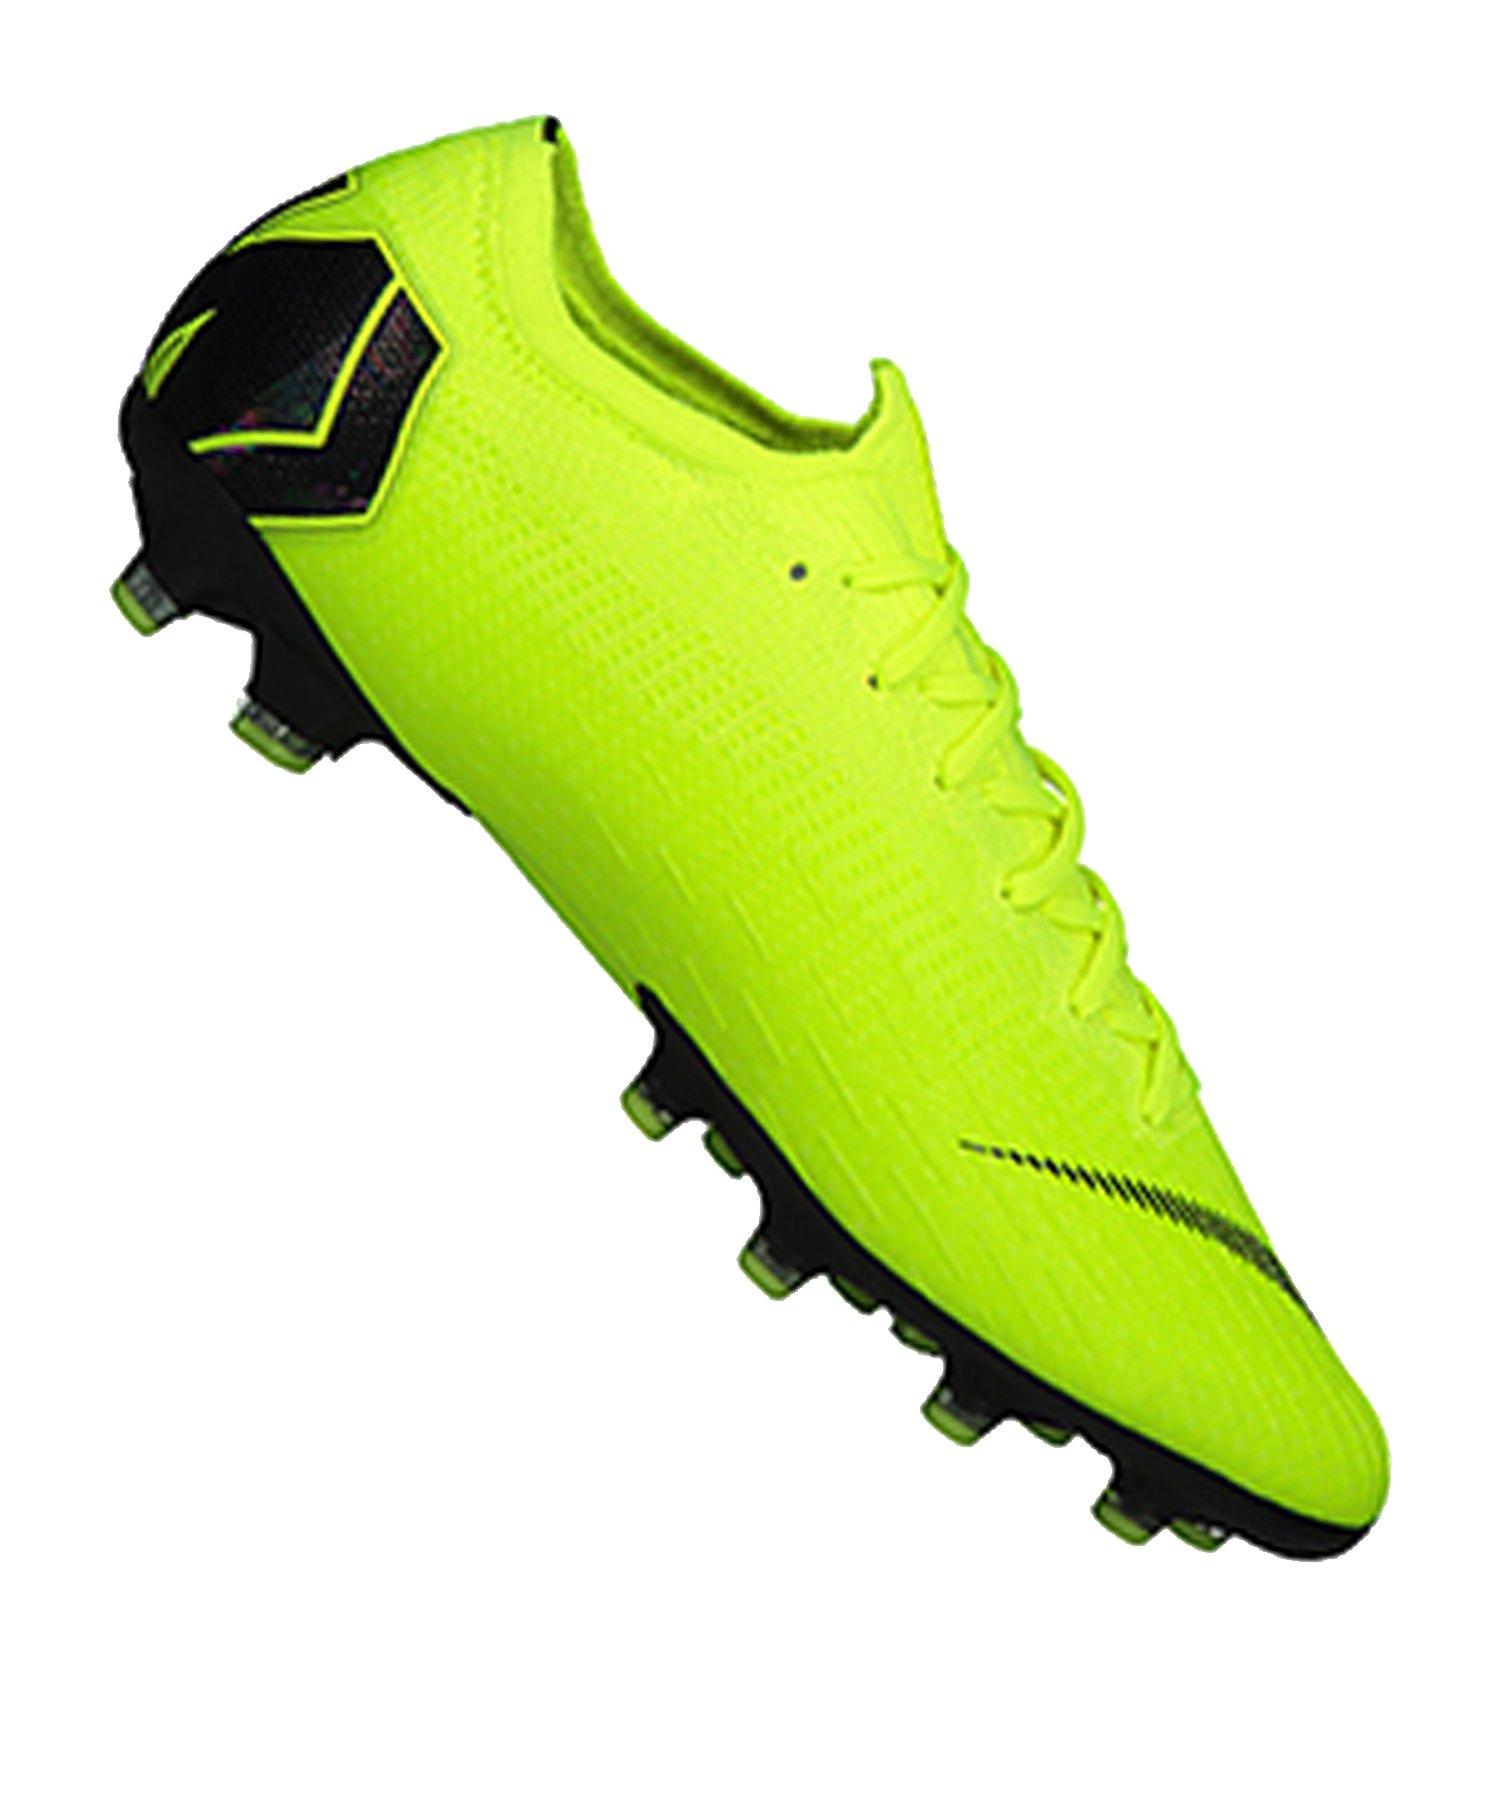 54166d00b0 Nike Mercurial Vapor XII Elite AG-Pro Gelb F701 | Cleets ...